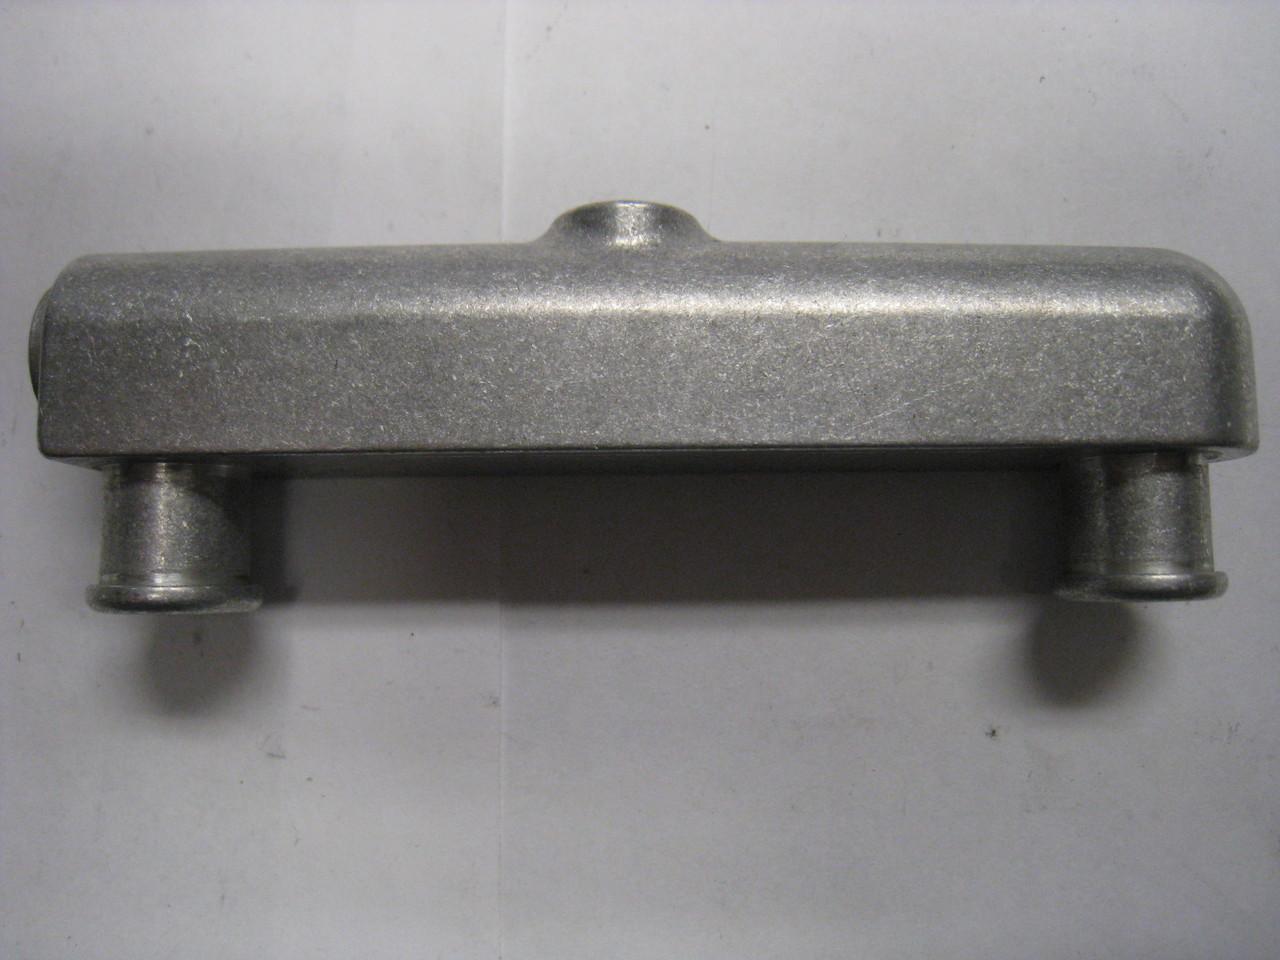 Brake Product, Aluminum Inlet Adapter Block, Fits The Aluminum Brake Master  Cylinder, 145X00X026-DUALPORT2